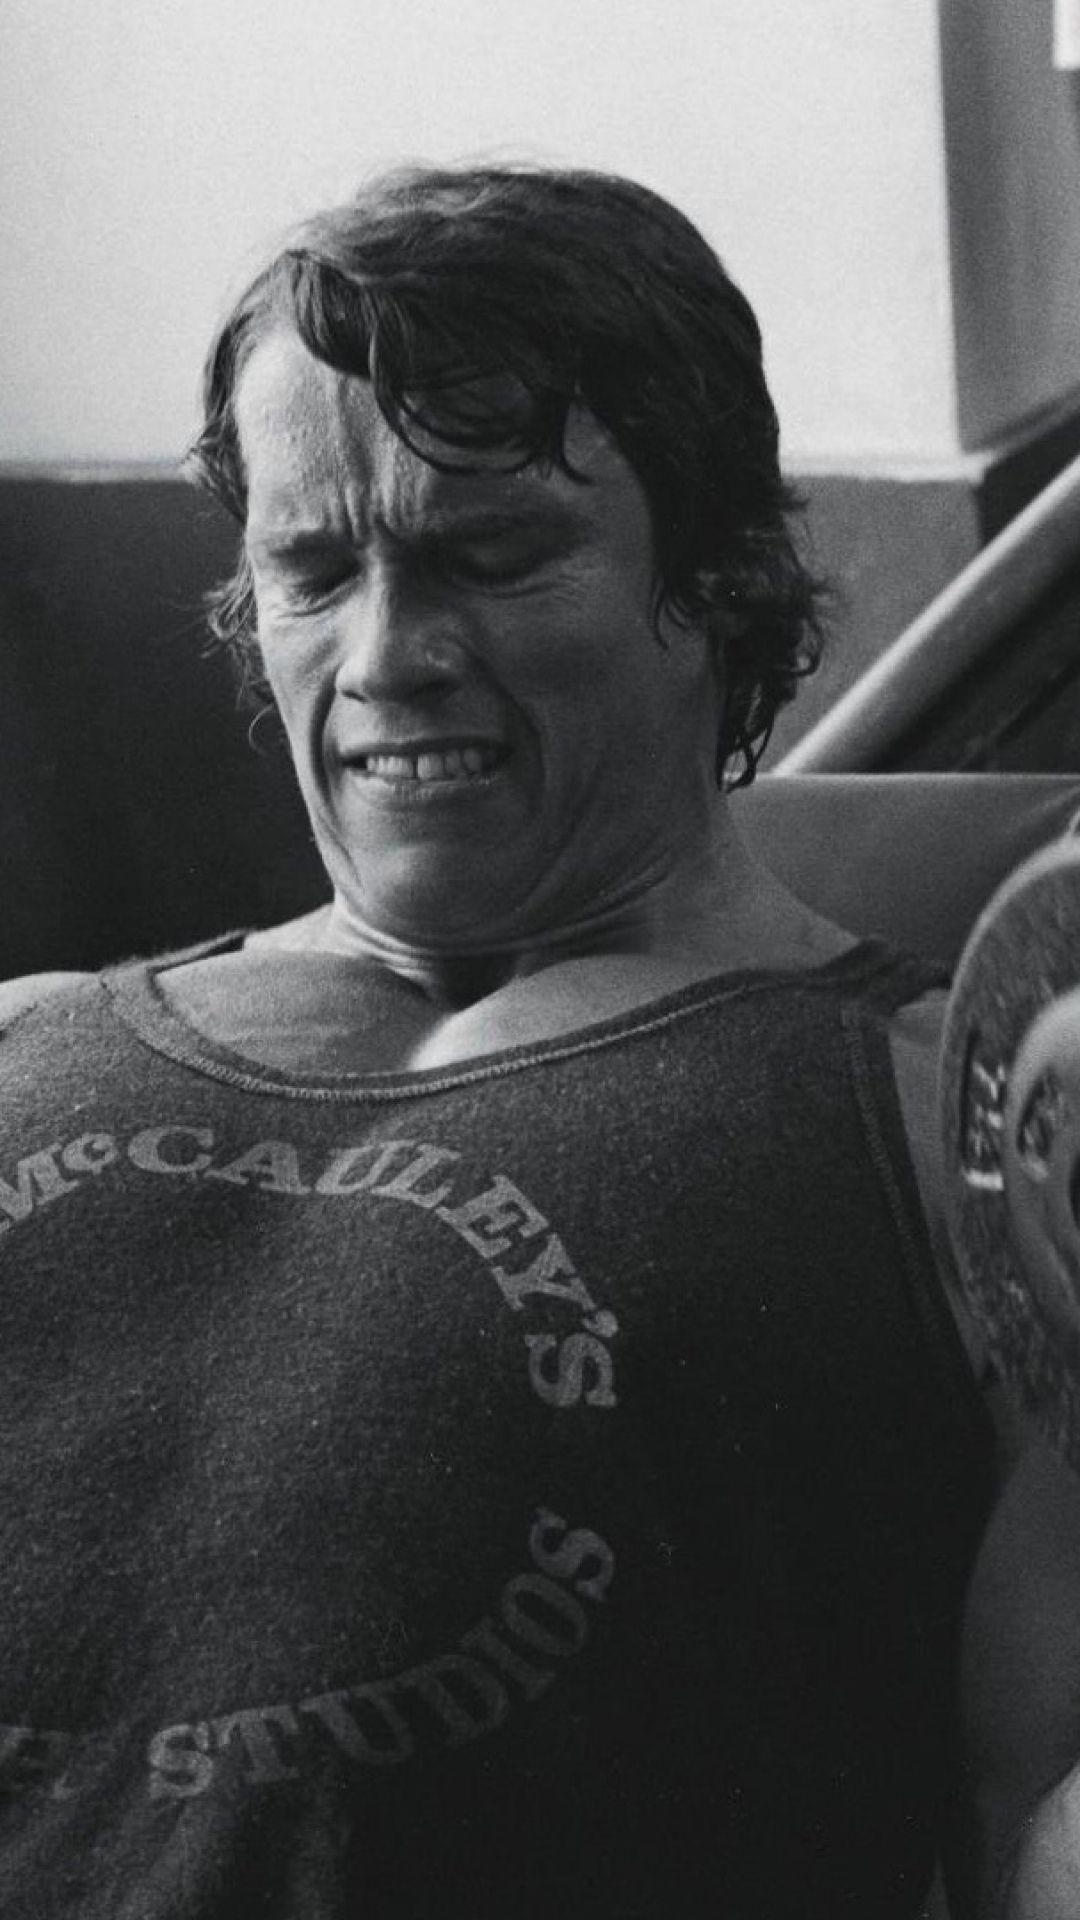 Arnold Schwarzenegger Iphone Wallpaper Free Download